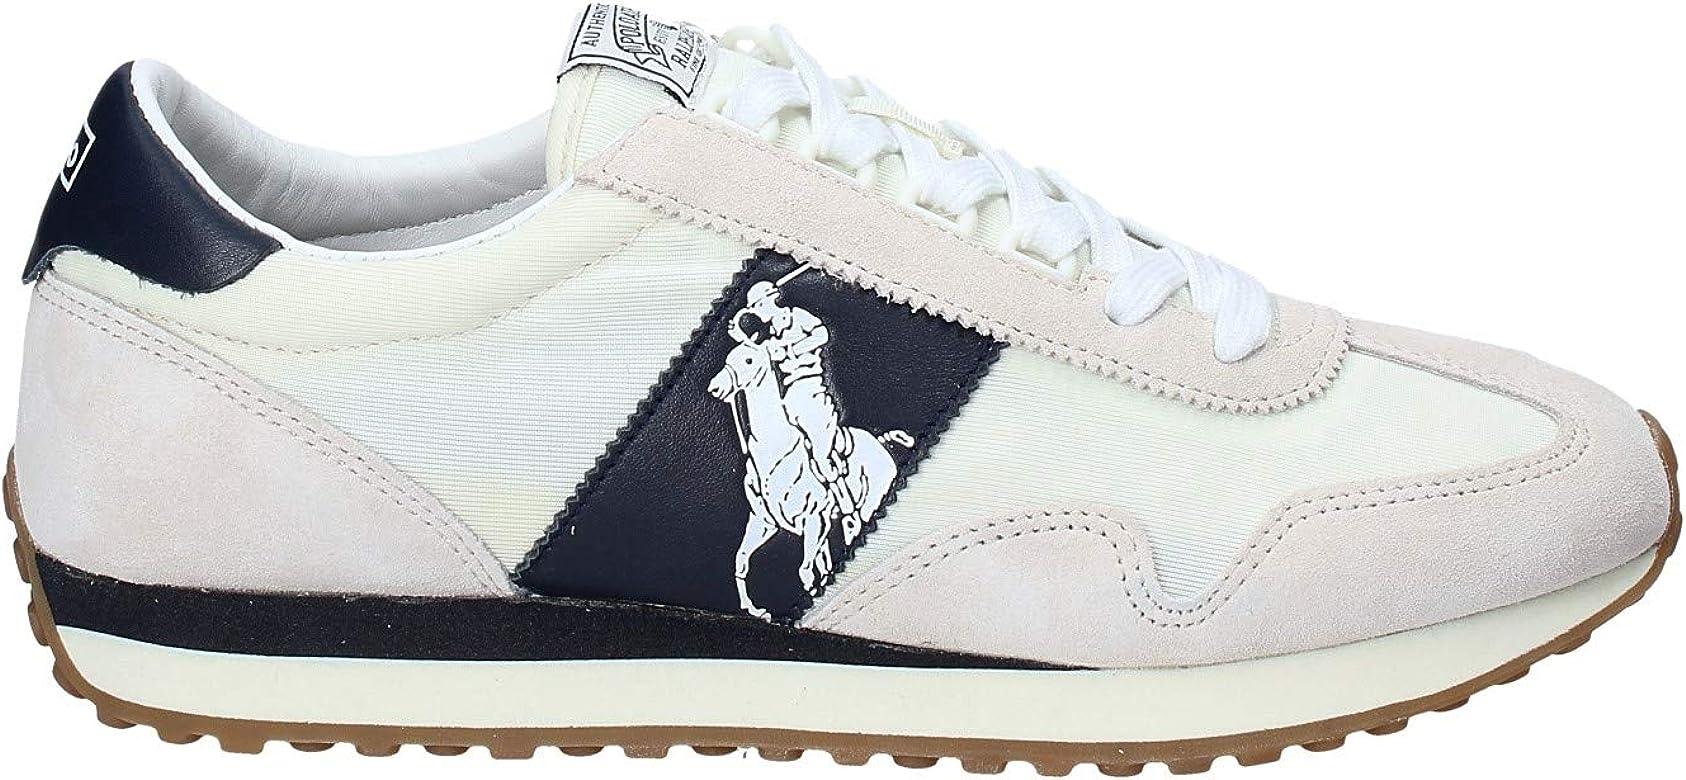 Polo sport 809755192003 Zapatos Hombre Blanco 42: Amazon.es ...